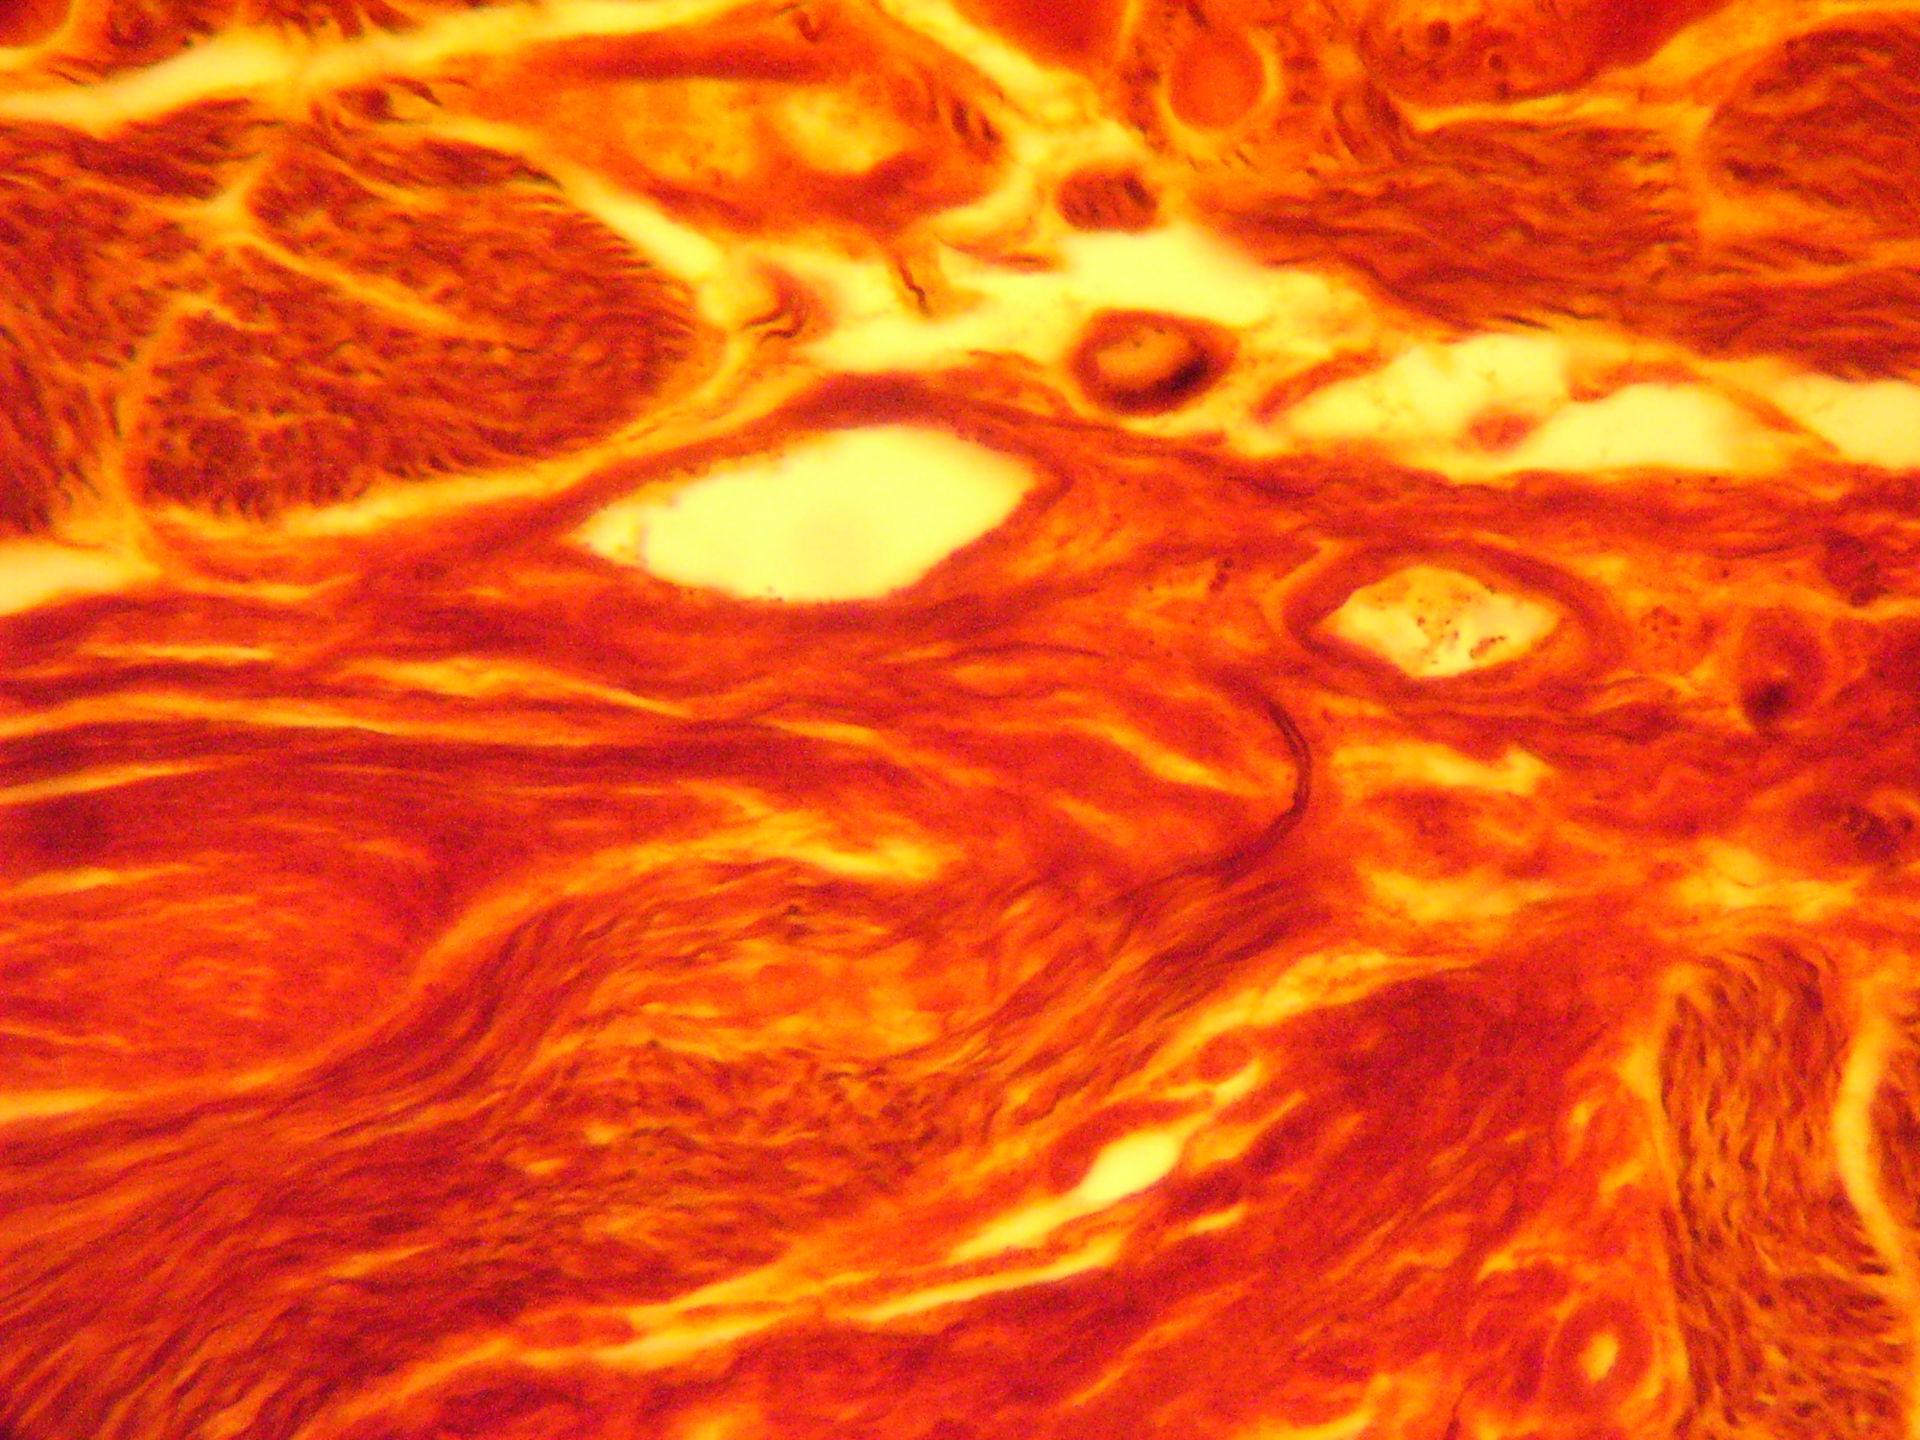 Multipolar ganglion cell